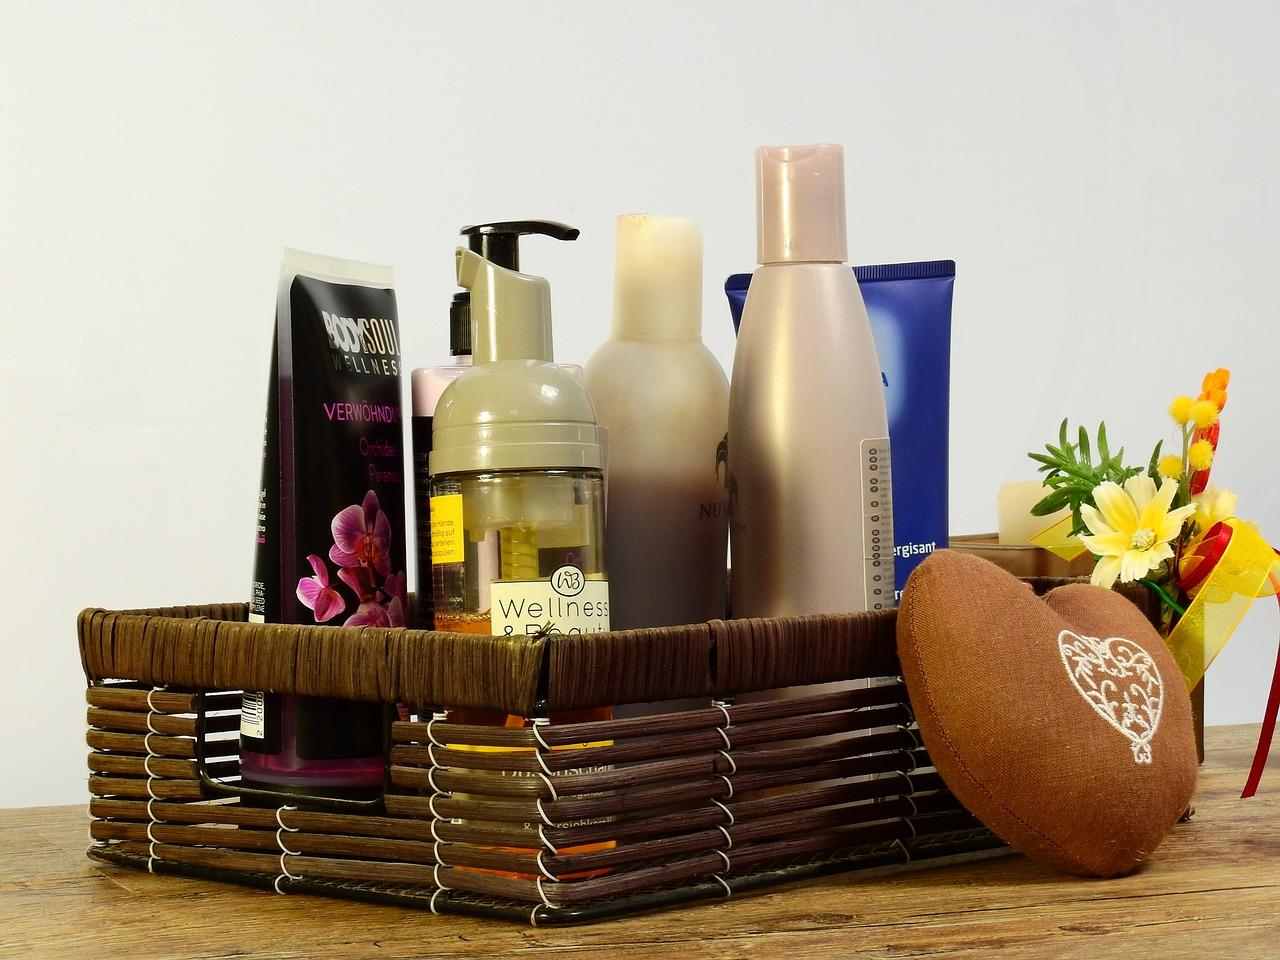 cosmetics-2389779-1280.jpg